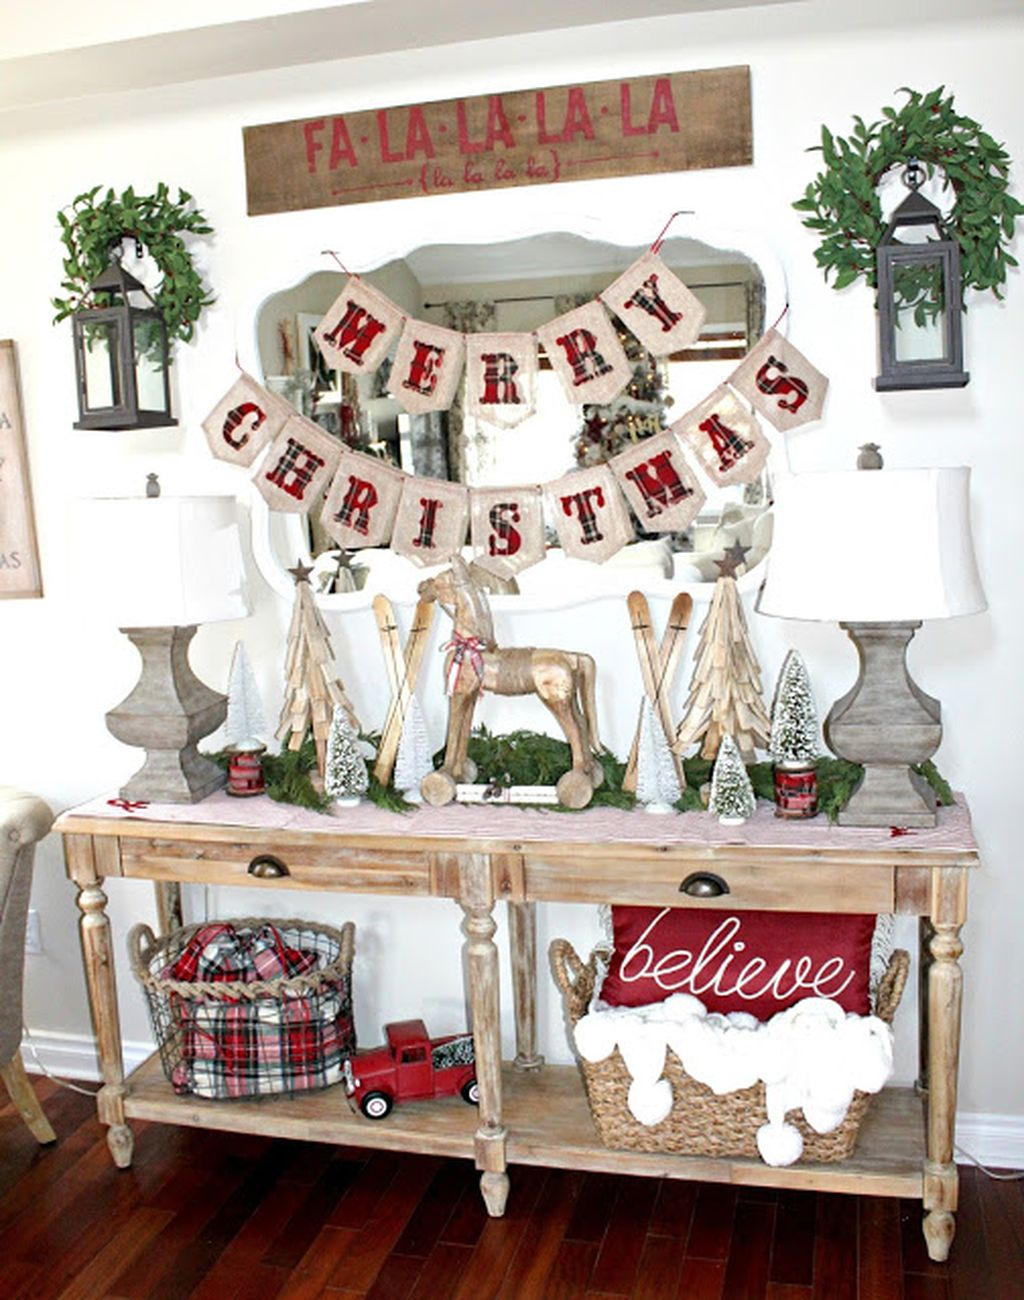 Incredible rustic farmhouse christmas decoration ideas 69 homedecorish - Incredible ideas for home ...